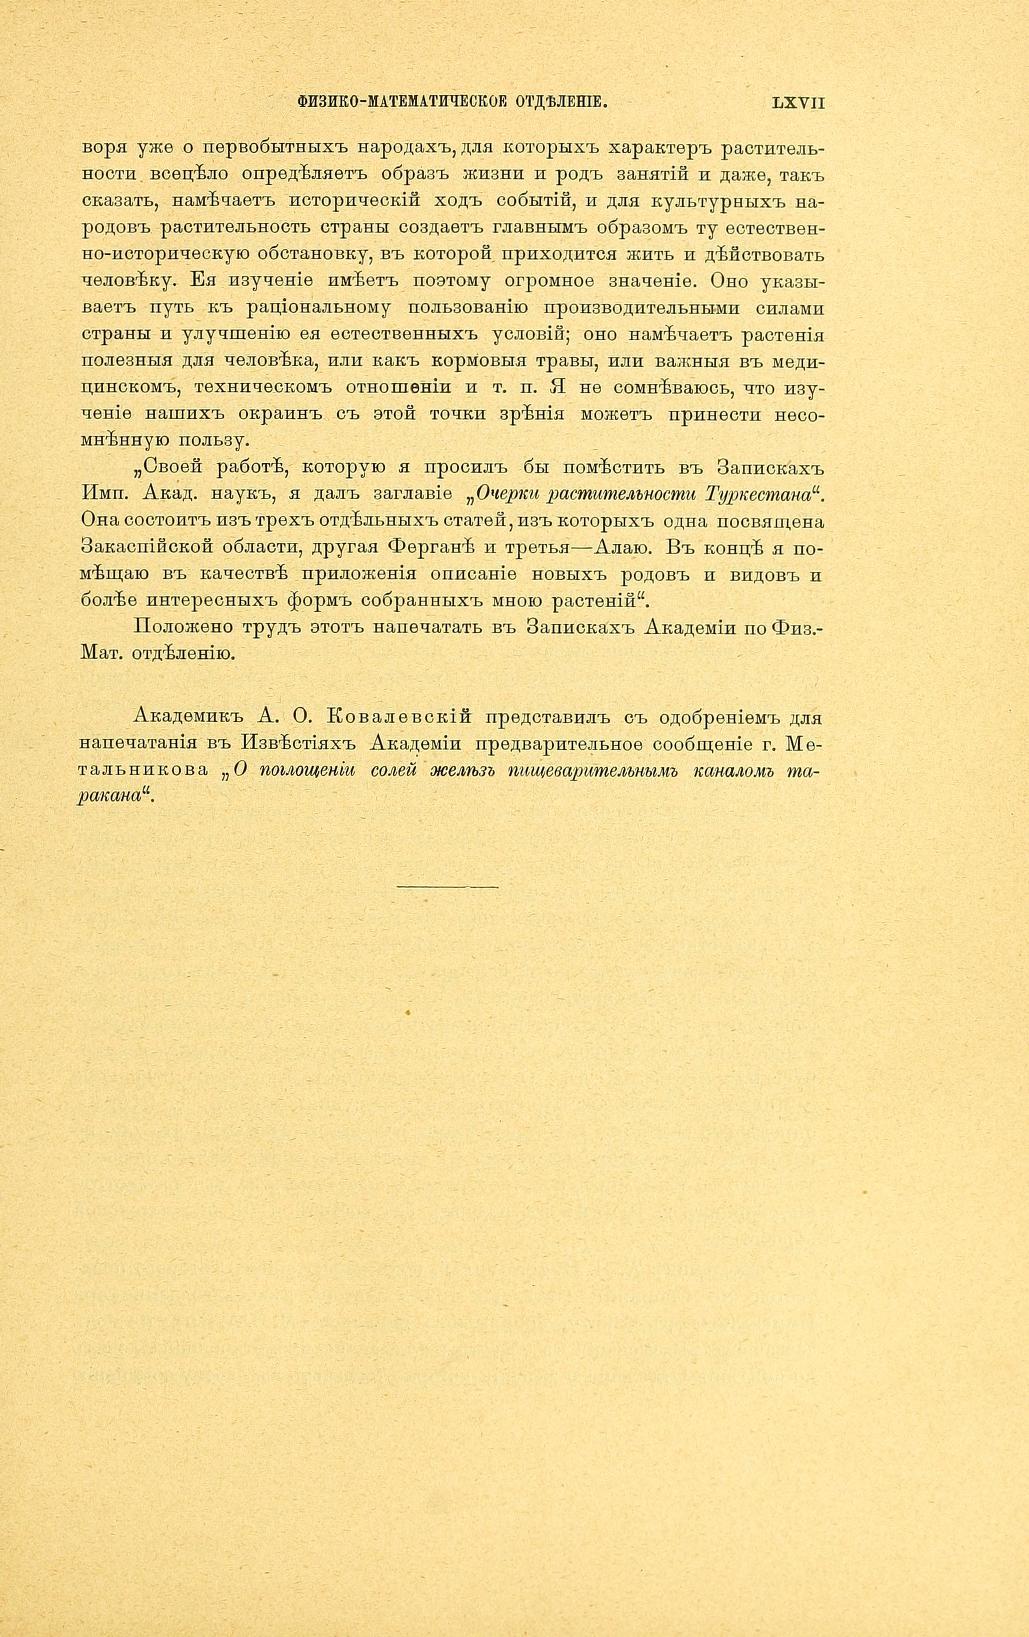 https://forum.plantarium.ru/misc.php?action=pun_attachment&item=28104&download=0